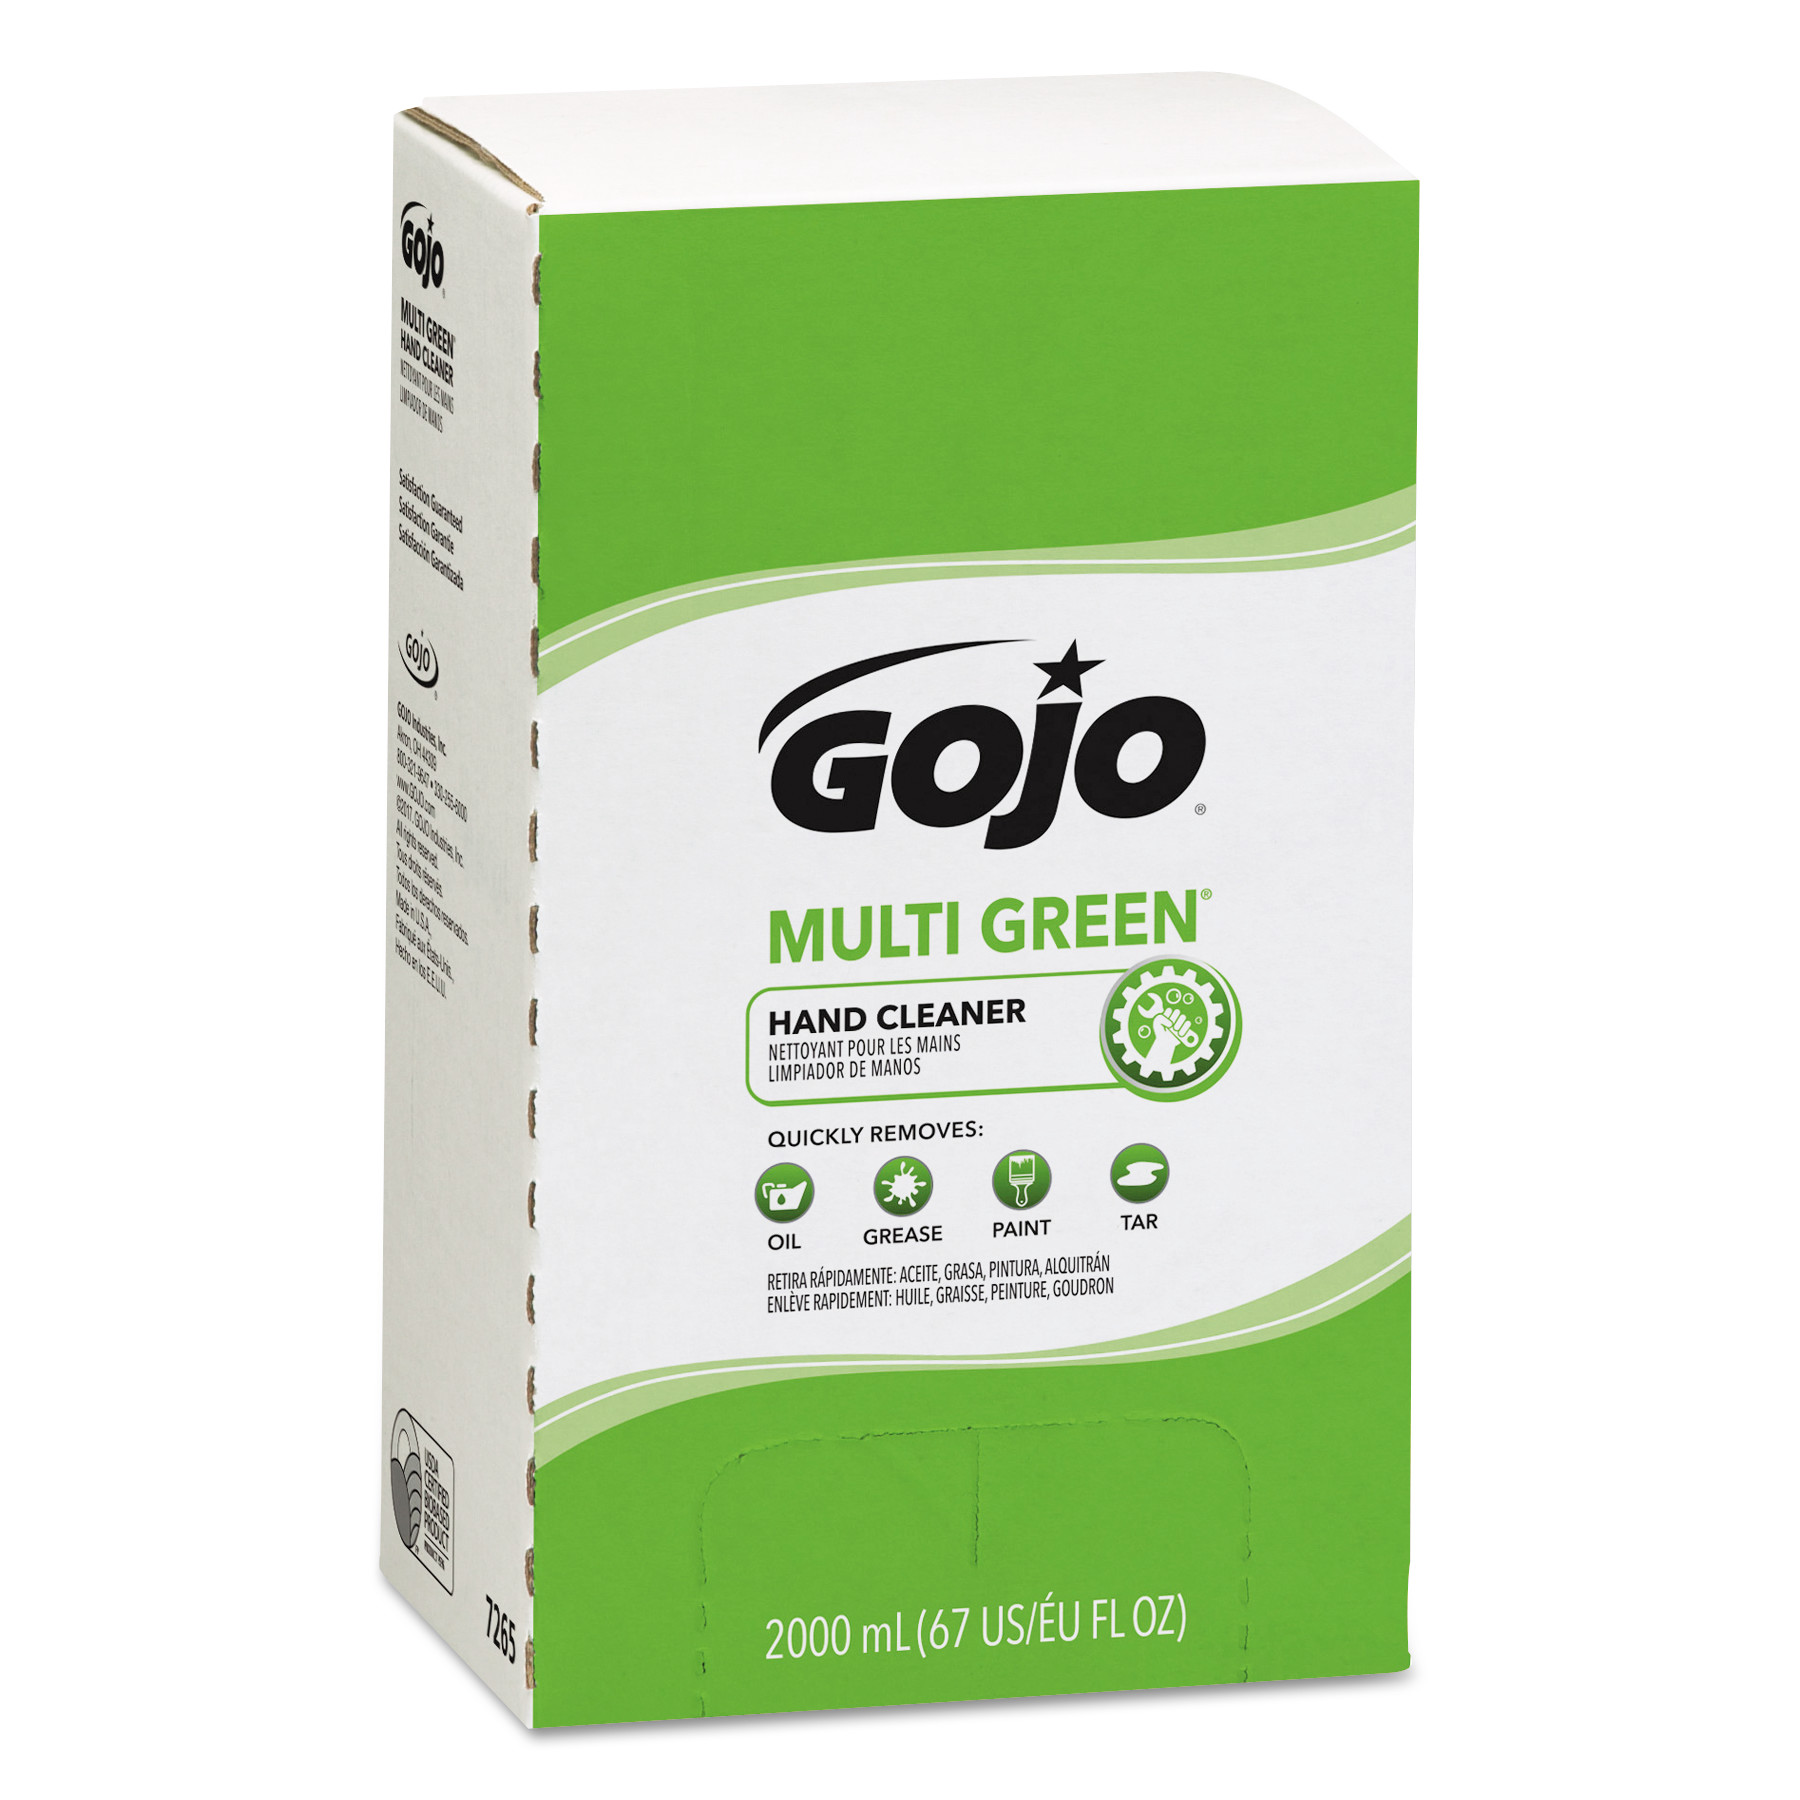 Gojo Multi Green Hand Cleaners, Citrus, Bag-in-Box, 2,000 mL